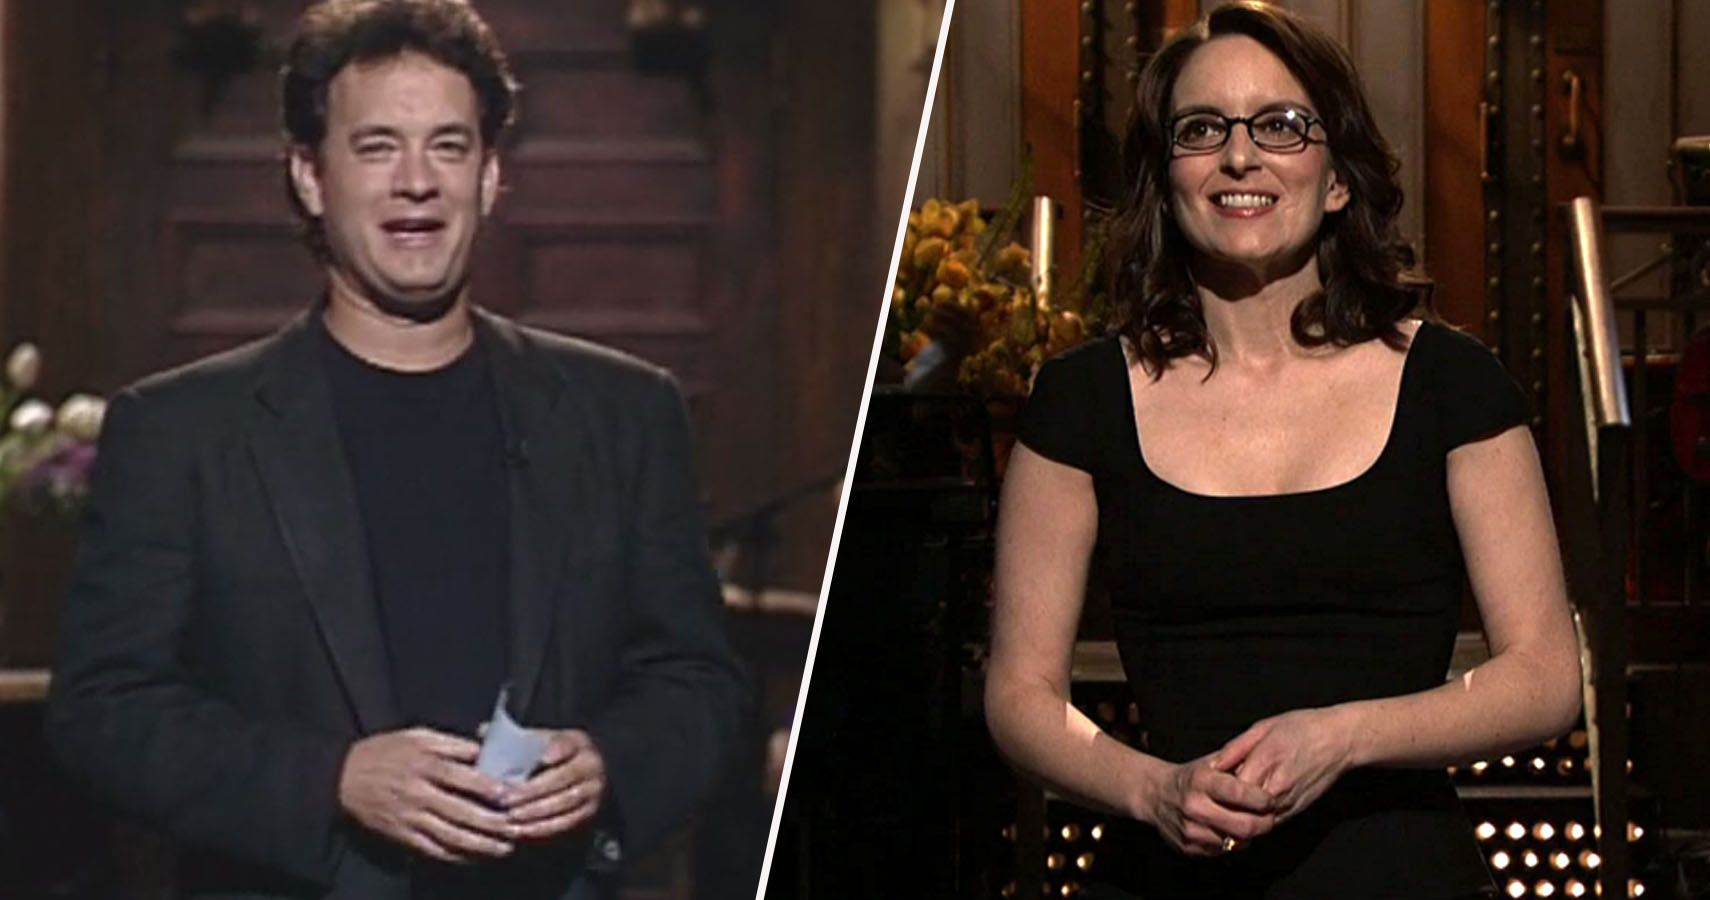 On Saturday Night Live, Melissa McCarthys Spicey Has